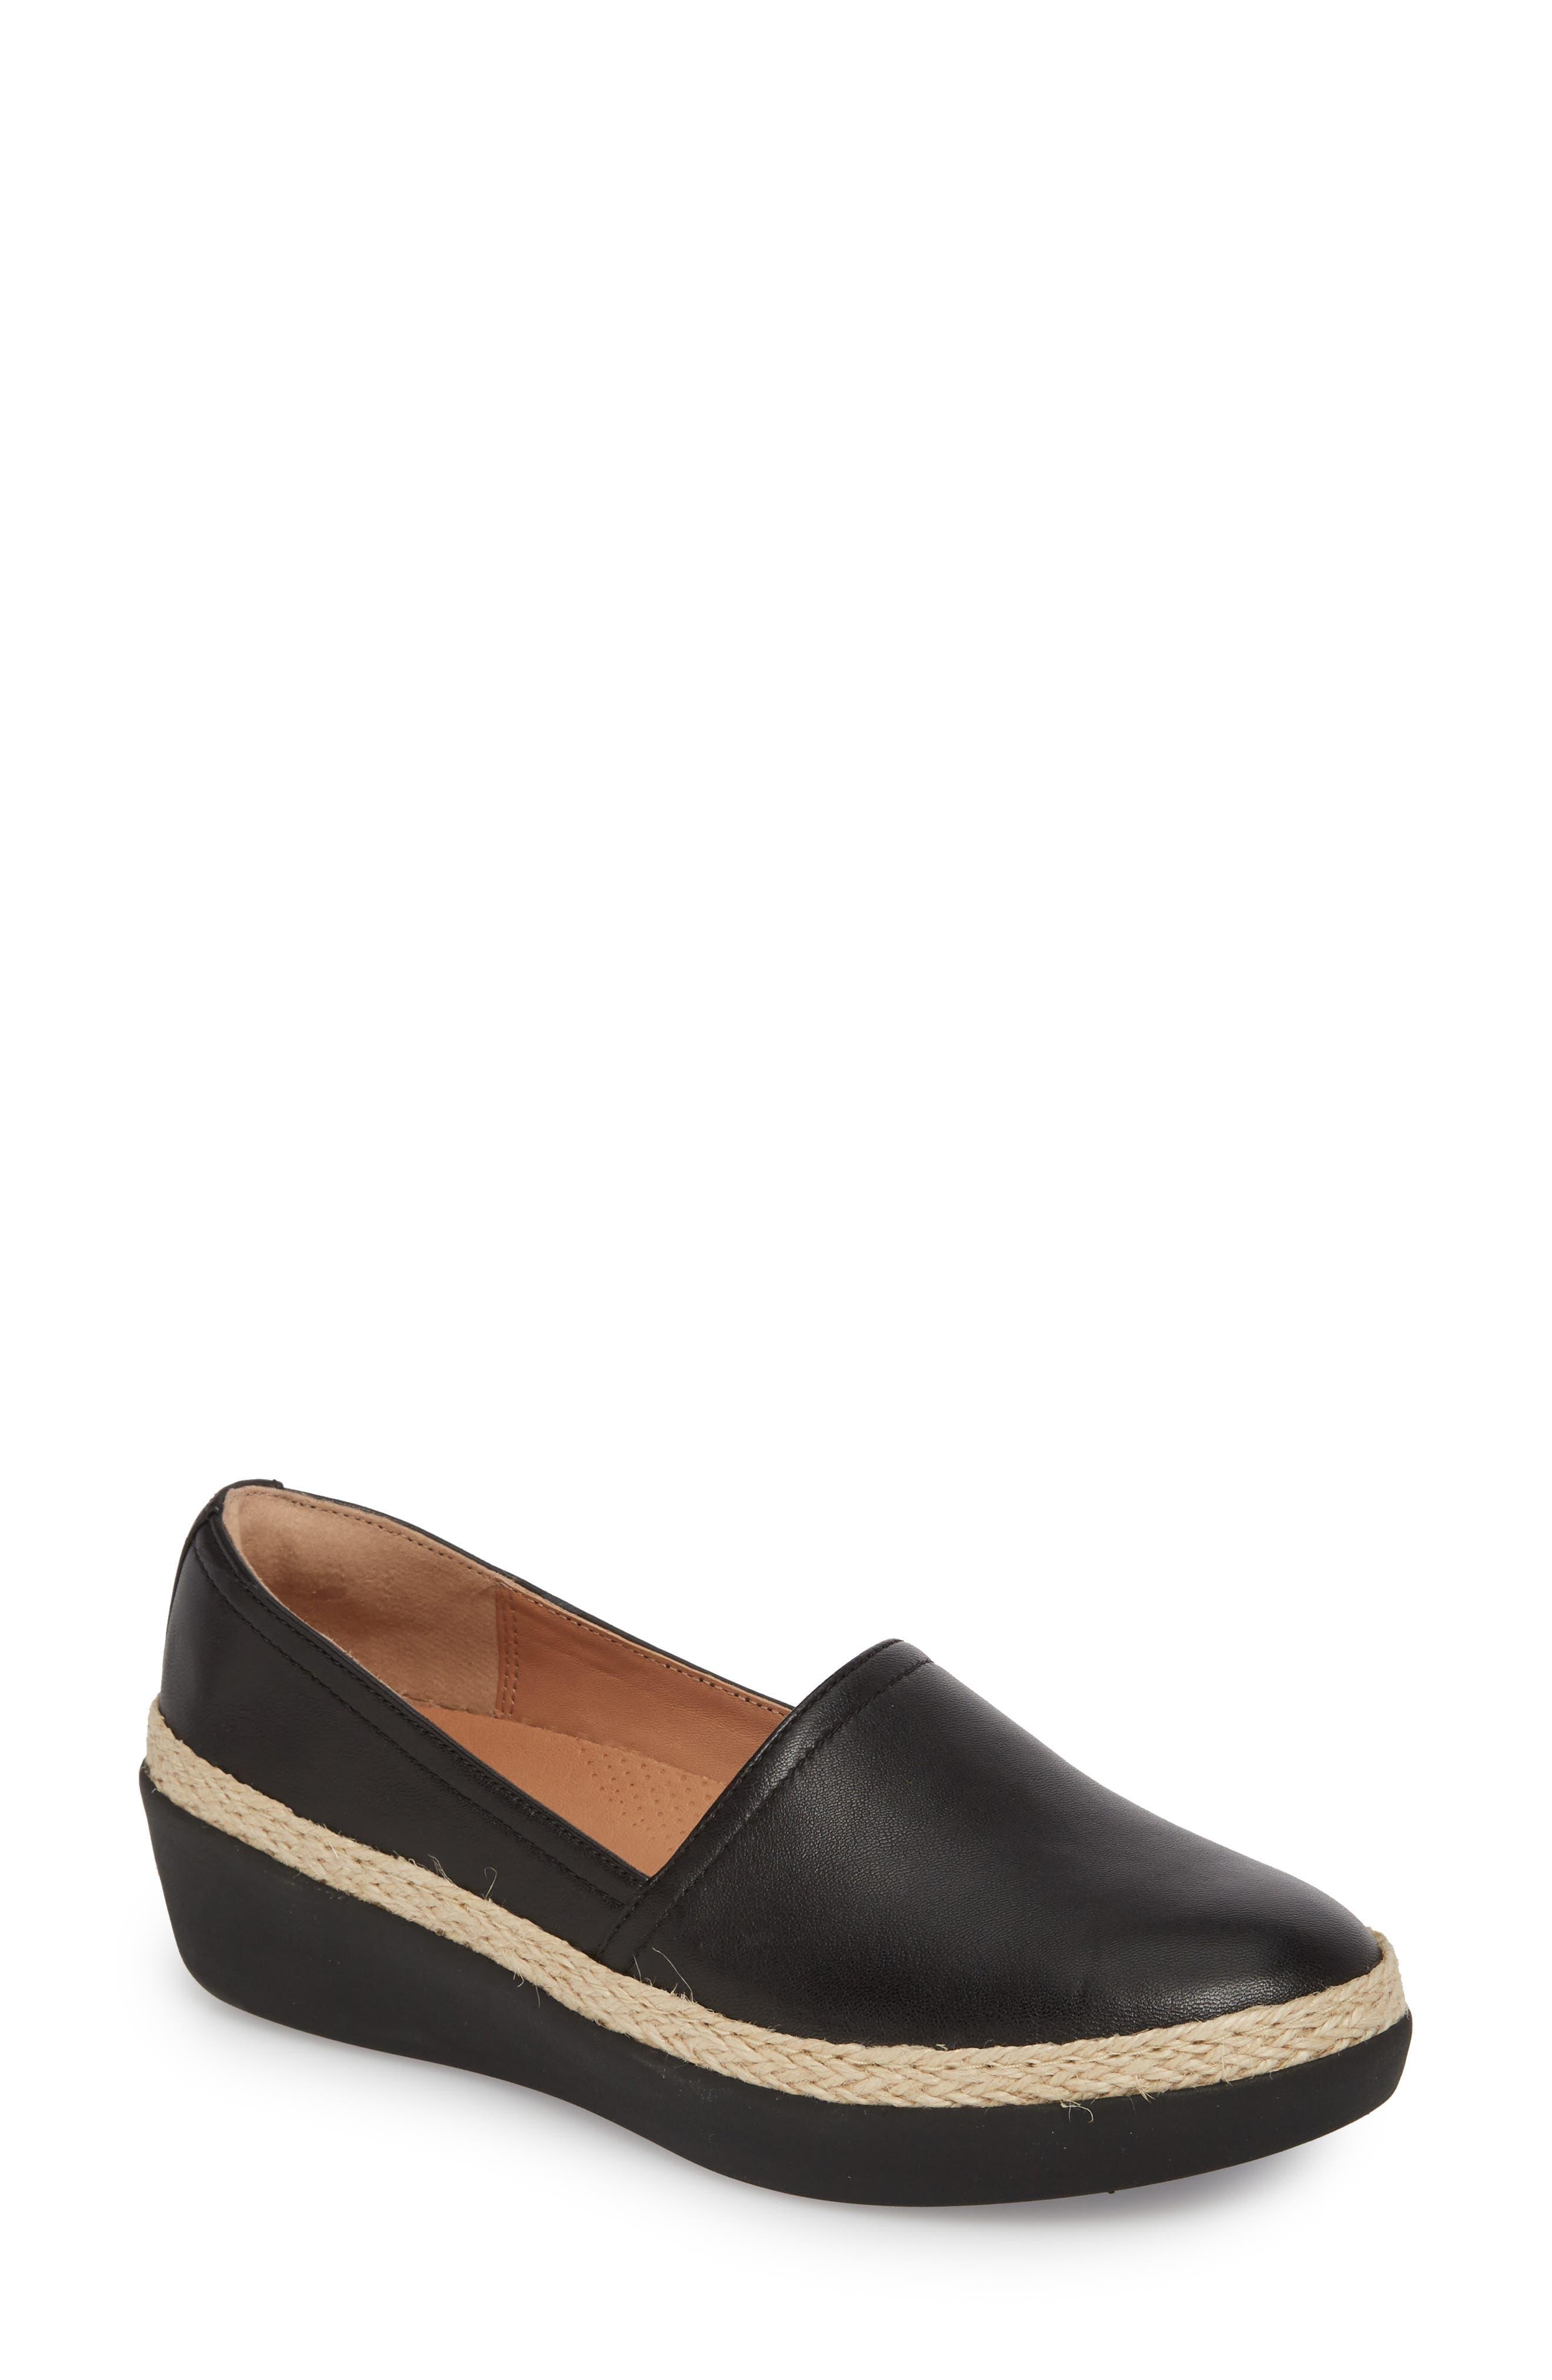 Casa Loafer,                         Main,                         color, Black Leather